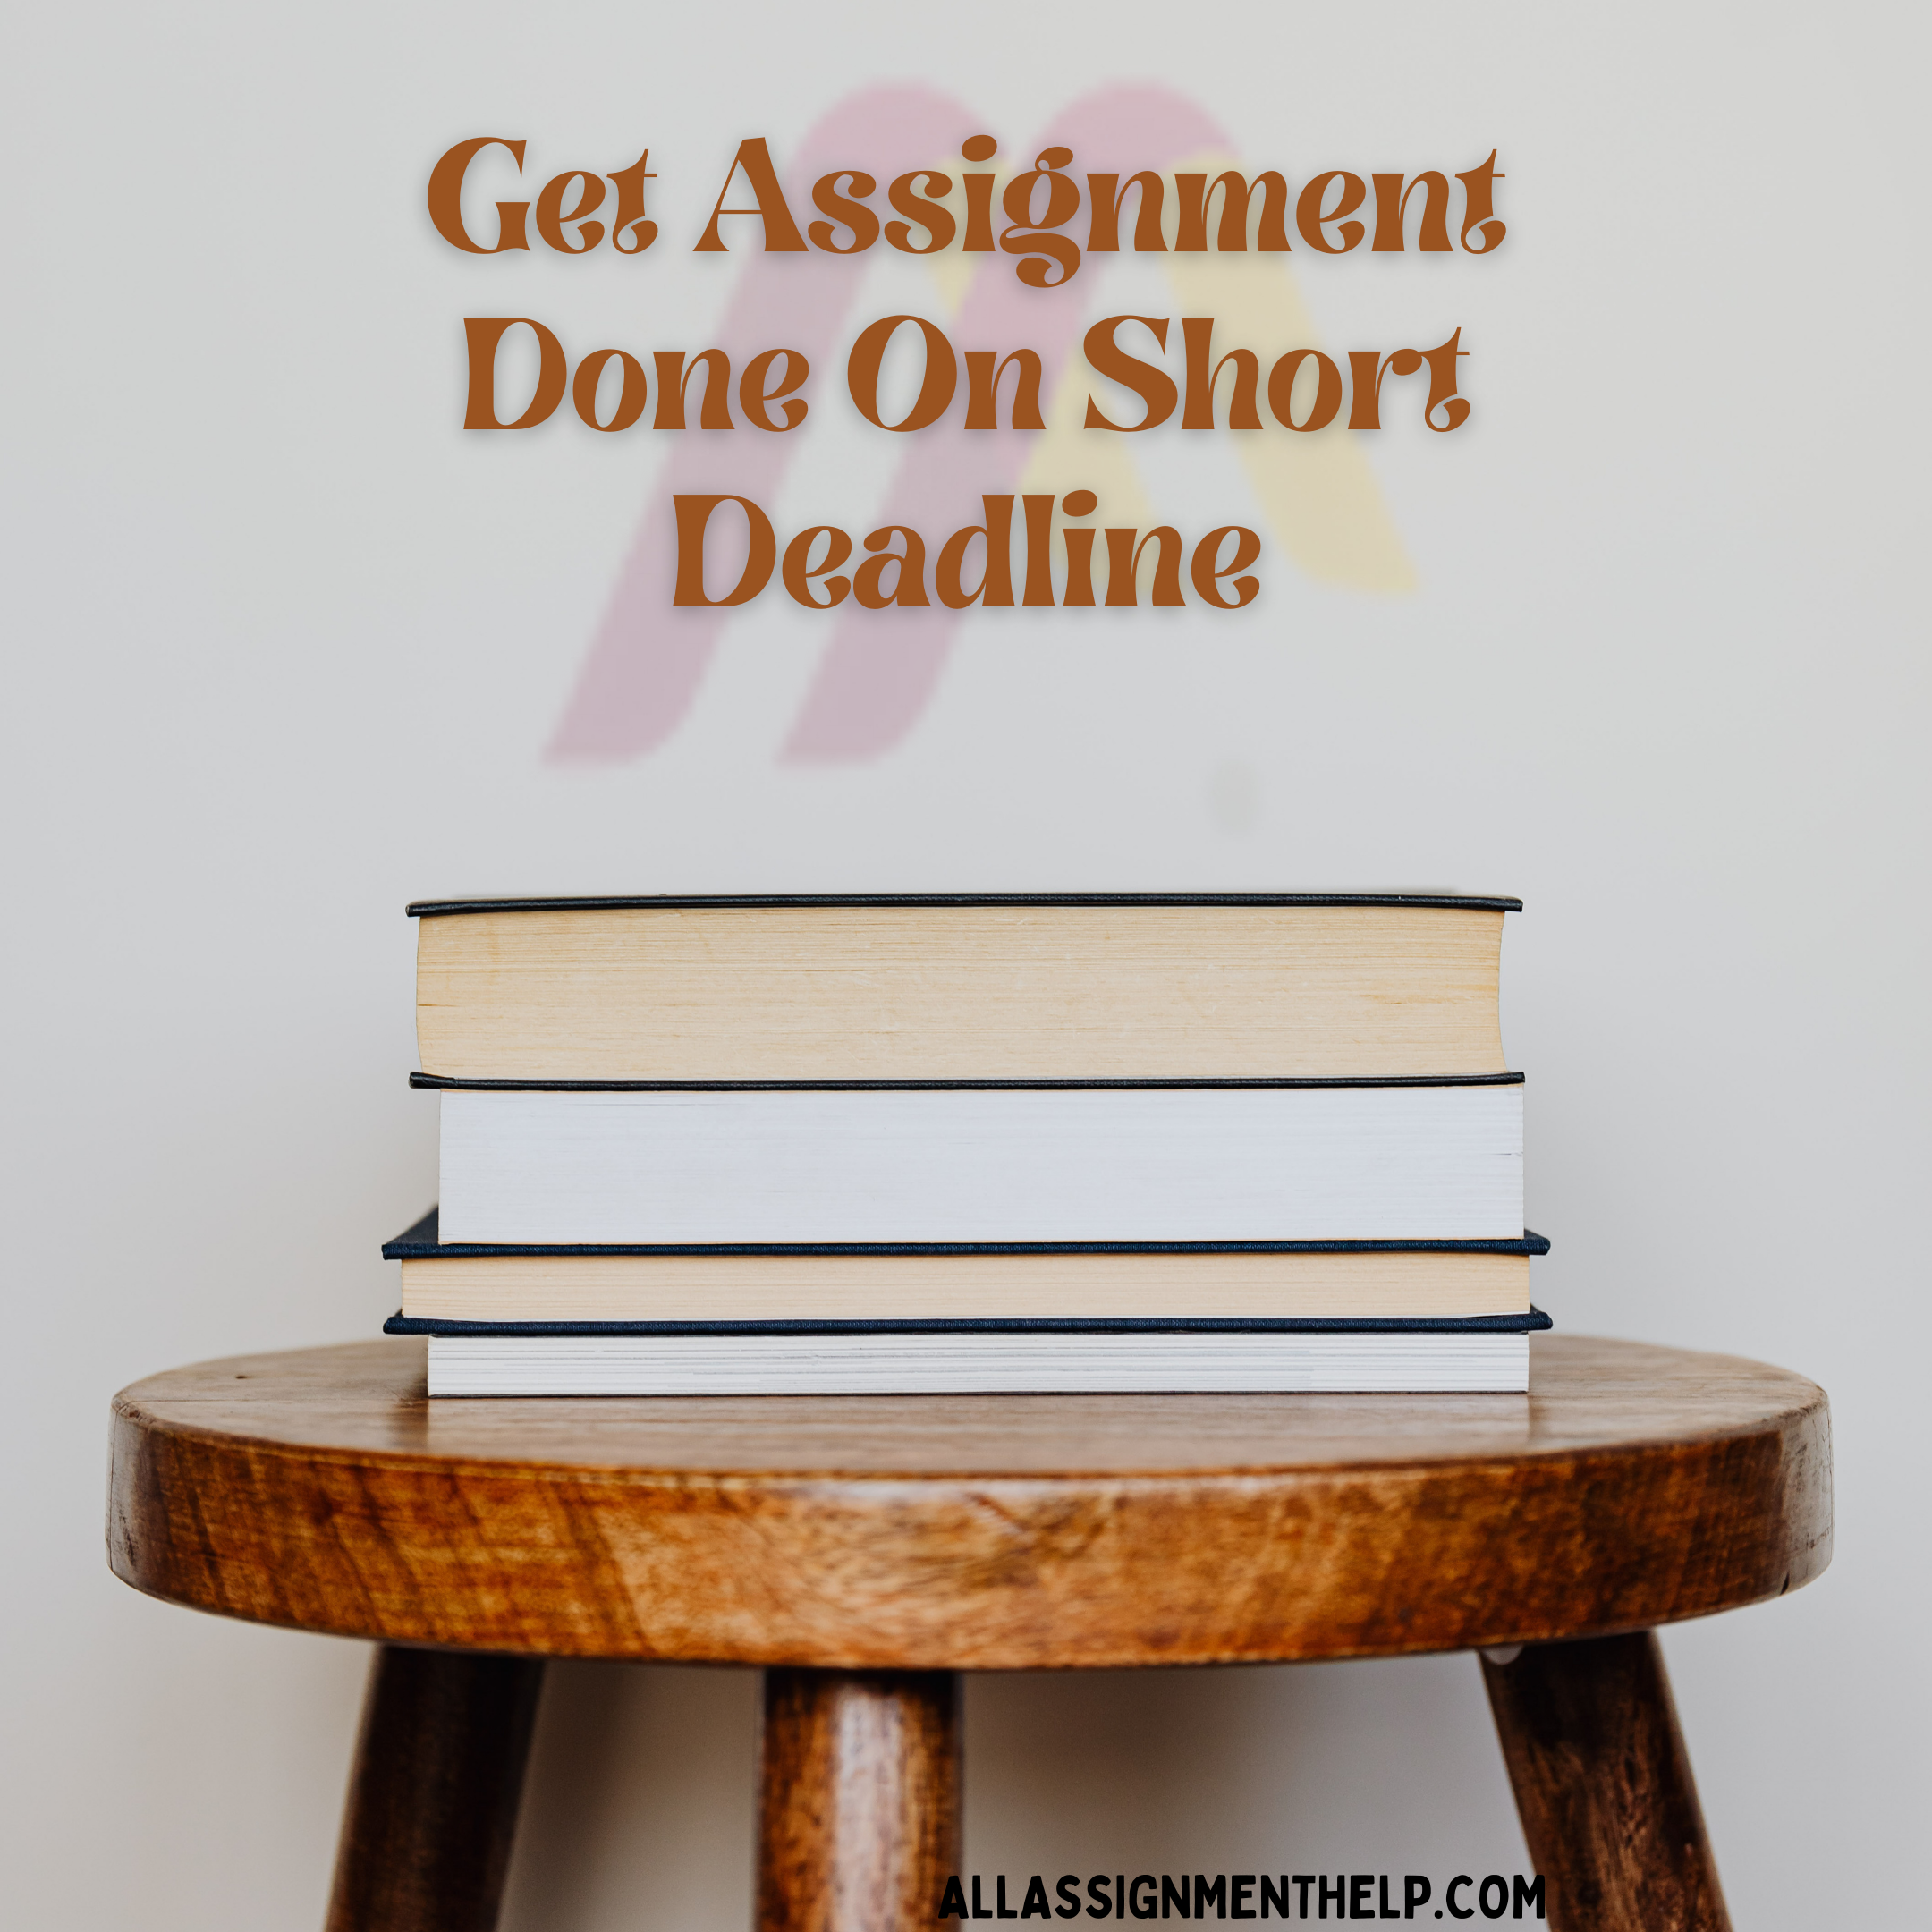 Get Assignment Done On short deadline